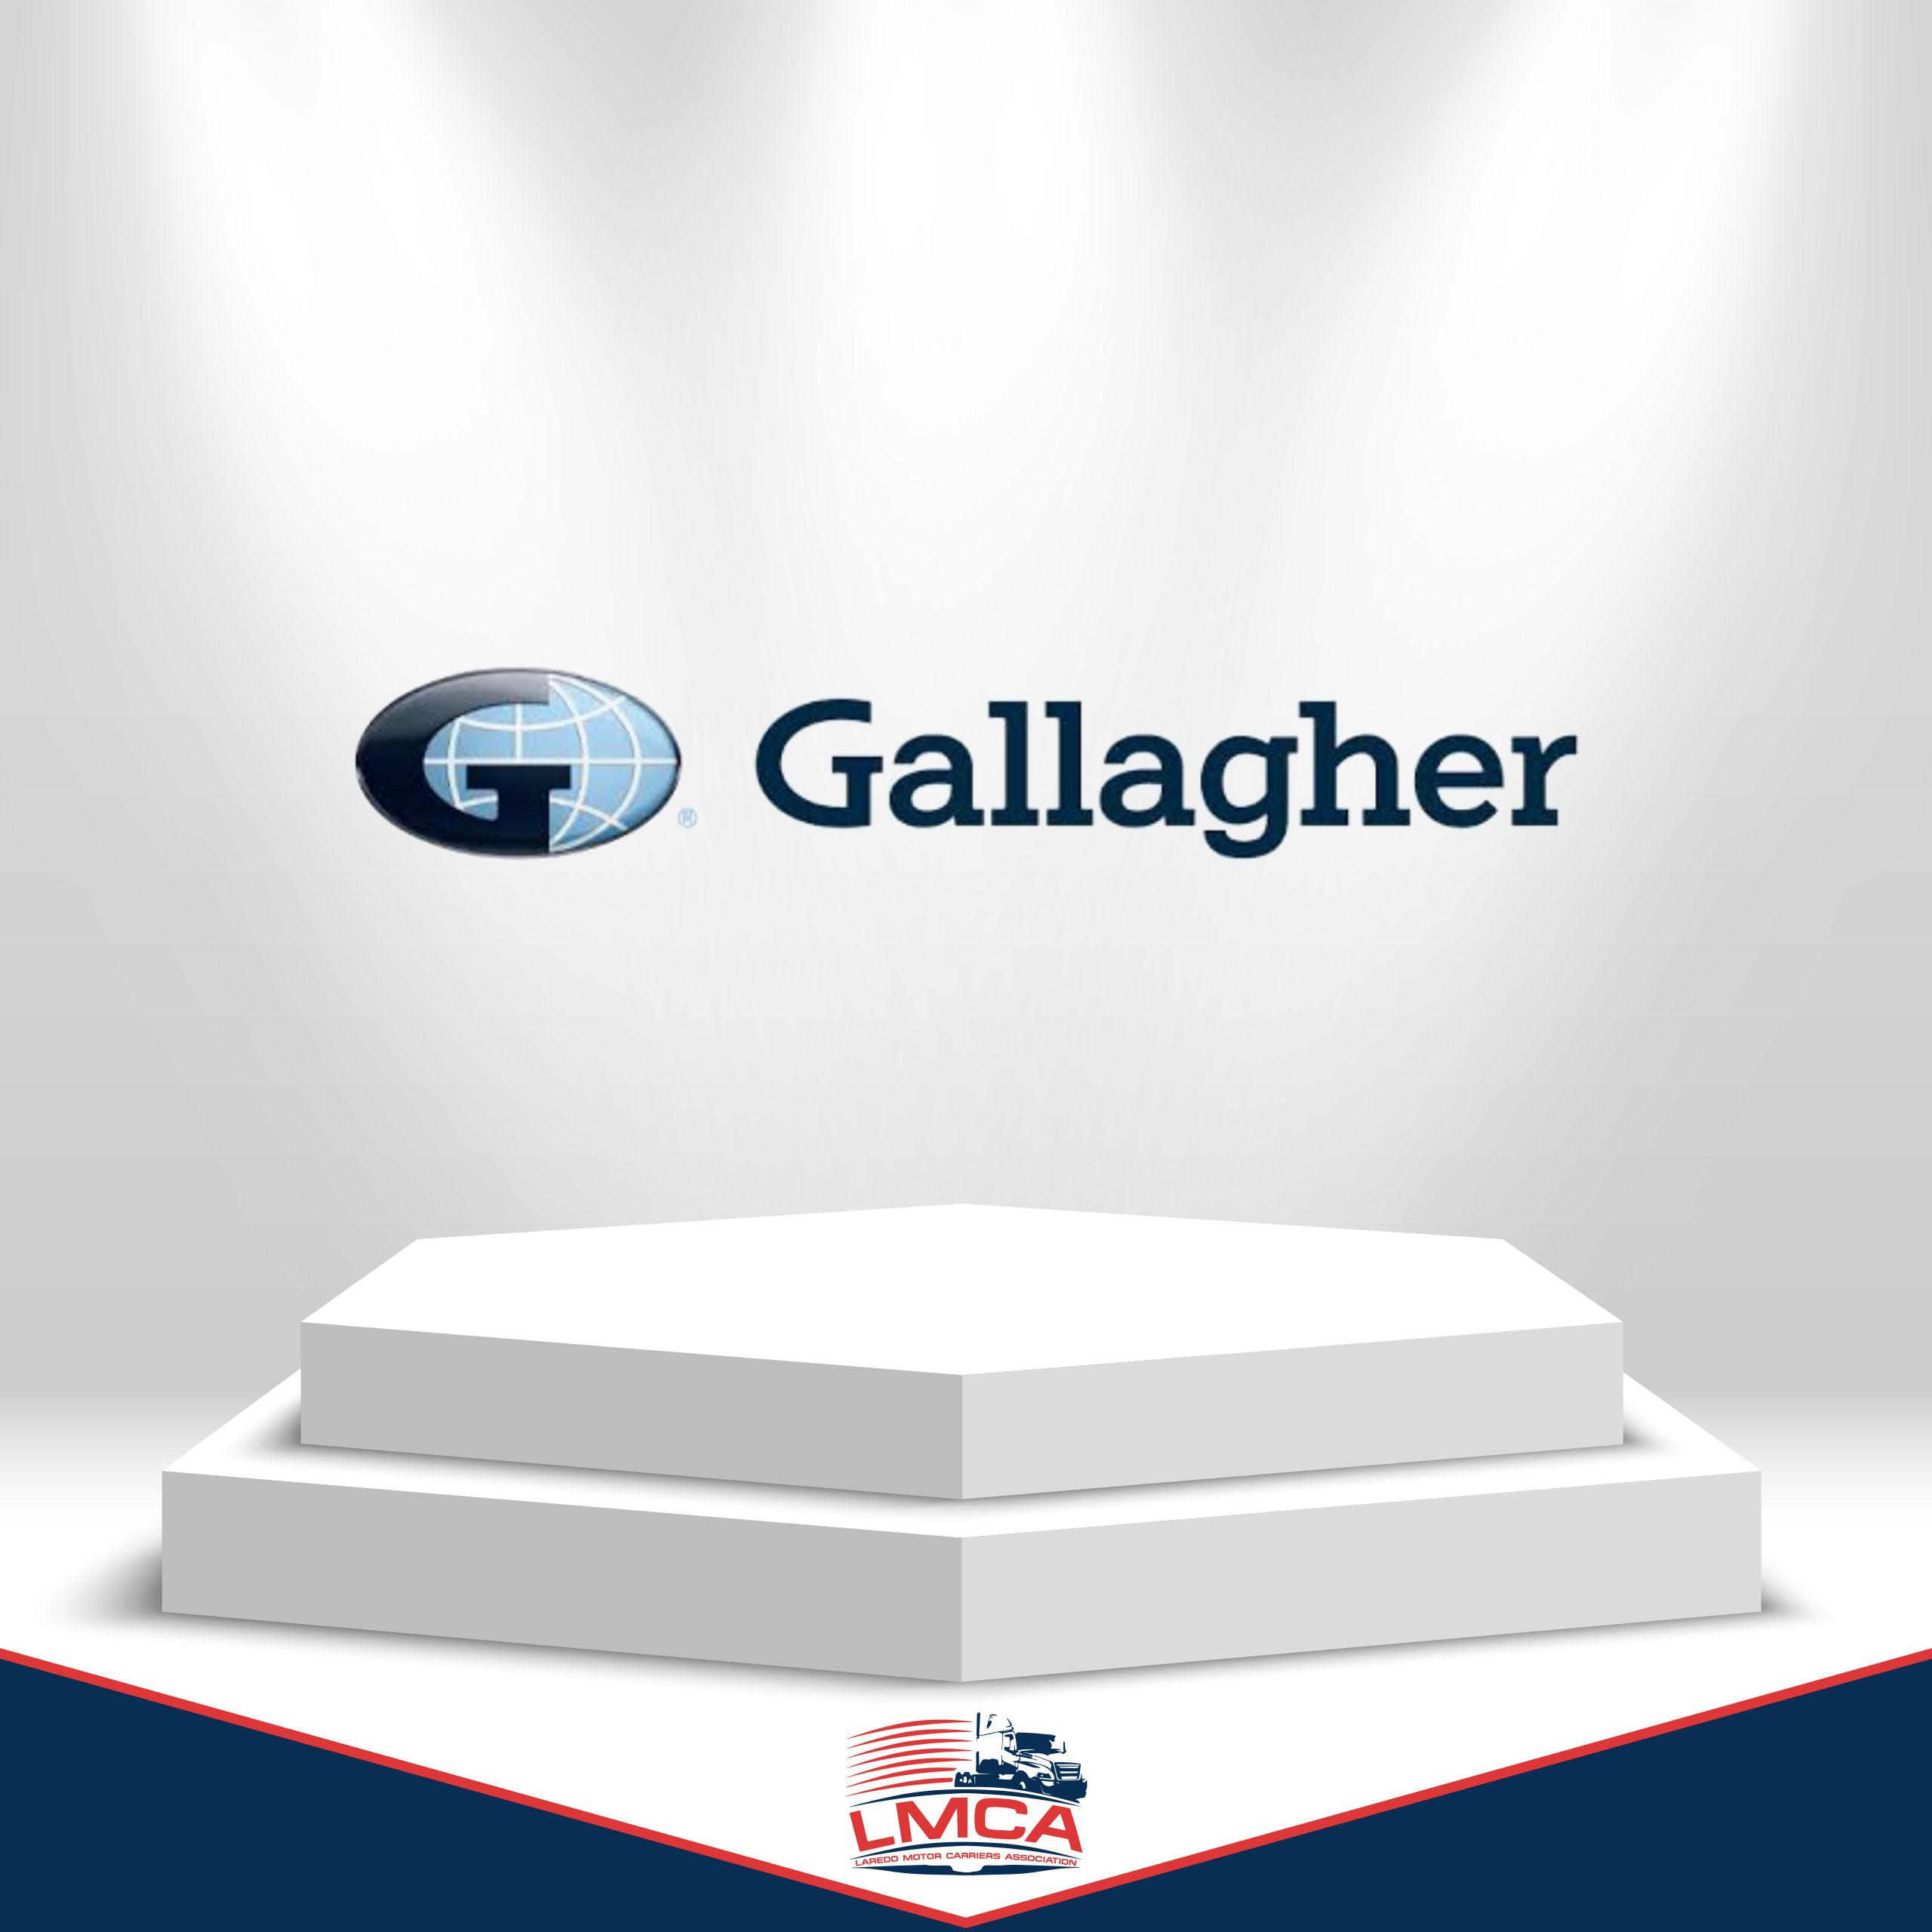 gallagher-lmca